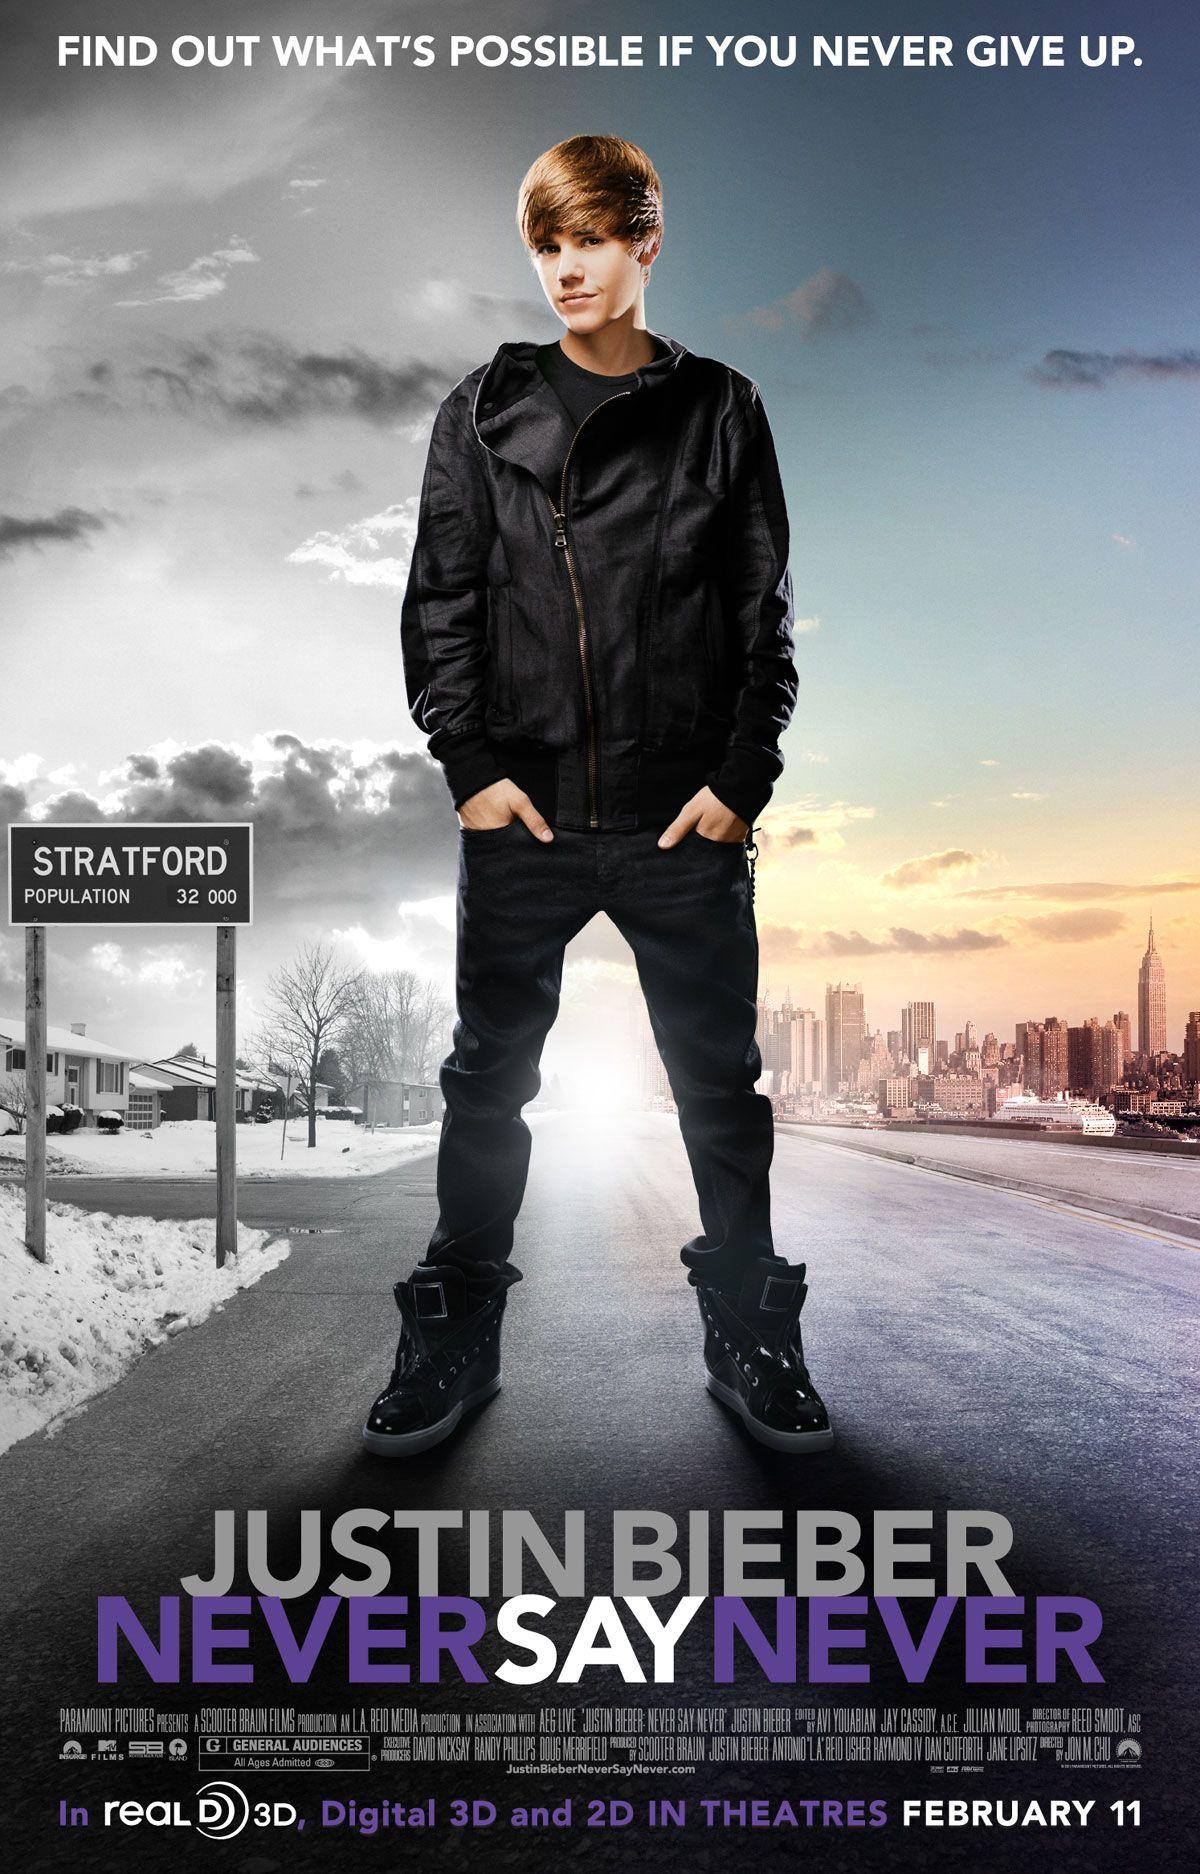 Justin Bieber Never Say Never Starring Justin Bieber Boys Ii Men Miley Cyrus Sean Kingston Follows Justin Bieber Justin Bieber Promo Flyer Mundo Musical